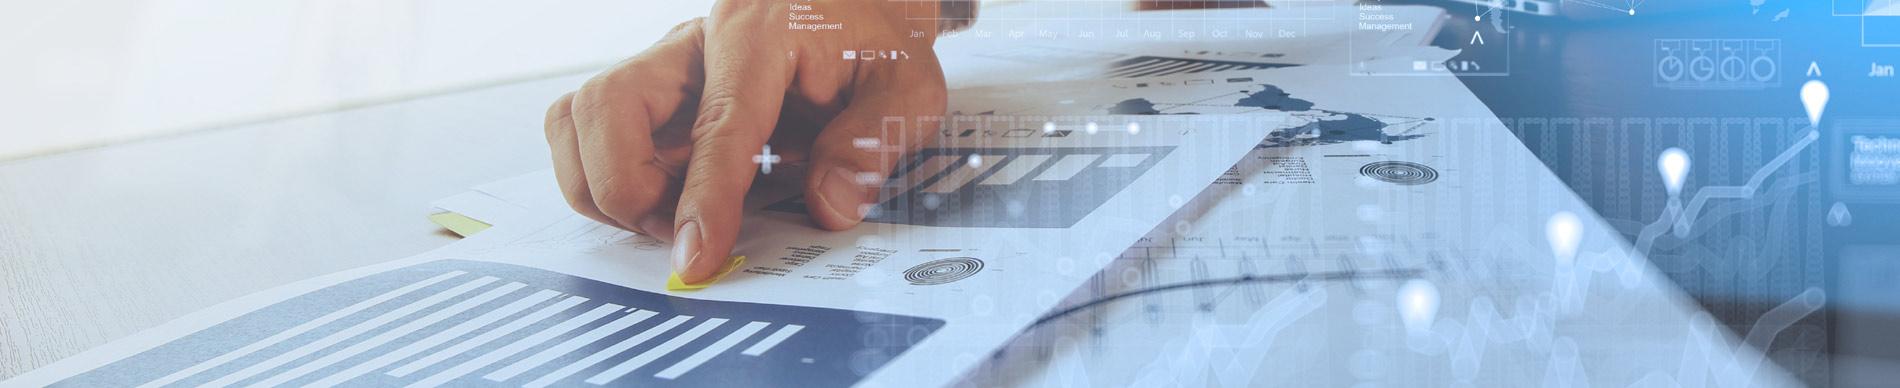 Knott Consulting Düsseldorf - Excel Tools